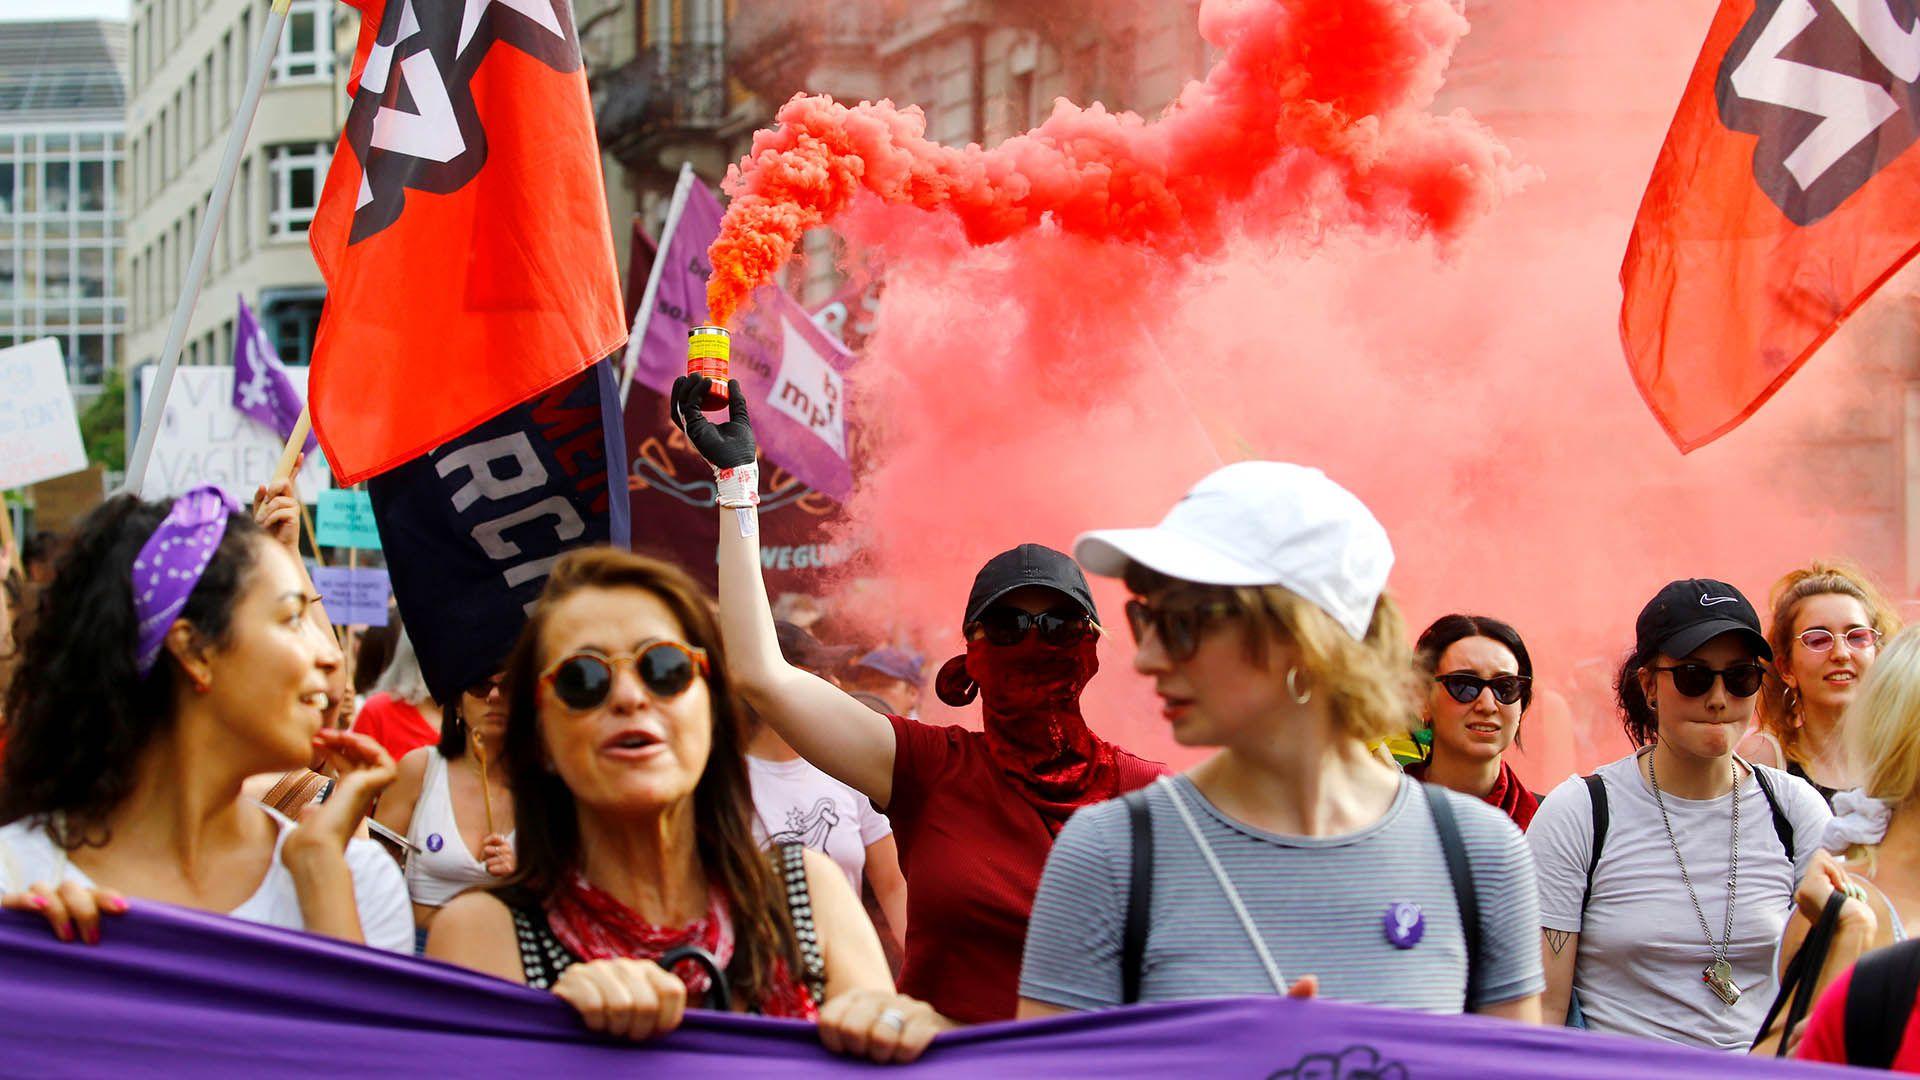 Masiva manifestación de mujeres en Zúrich, Suiza (REUTERS/Arnd Wiegmann)